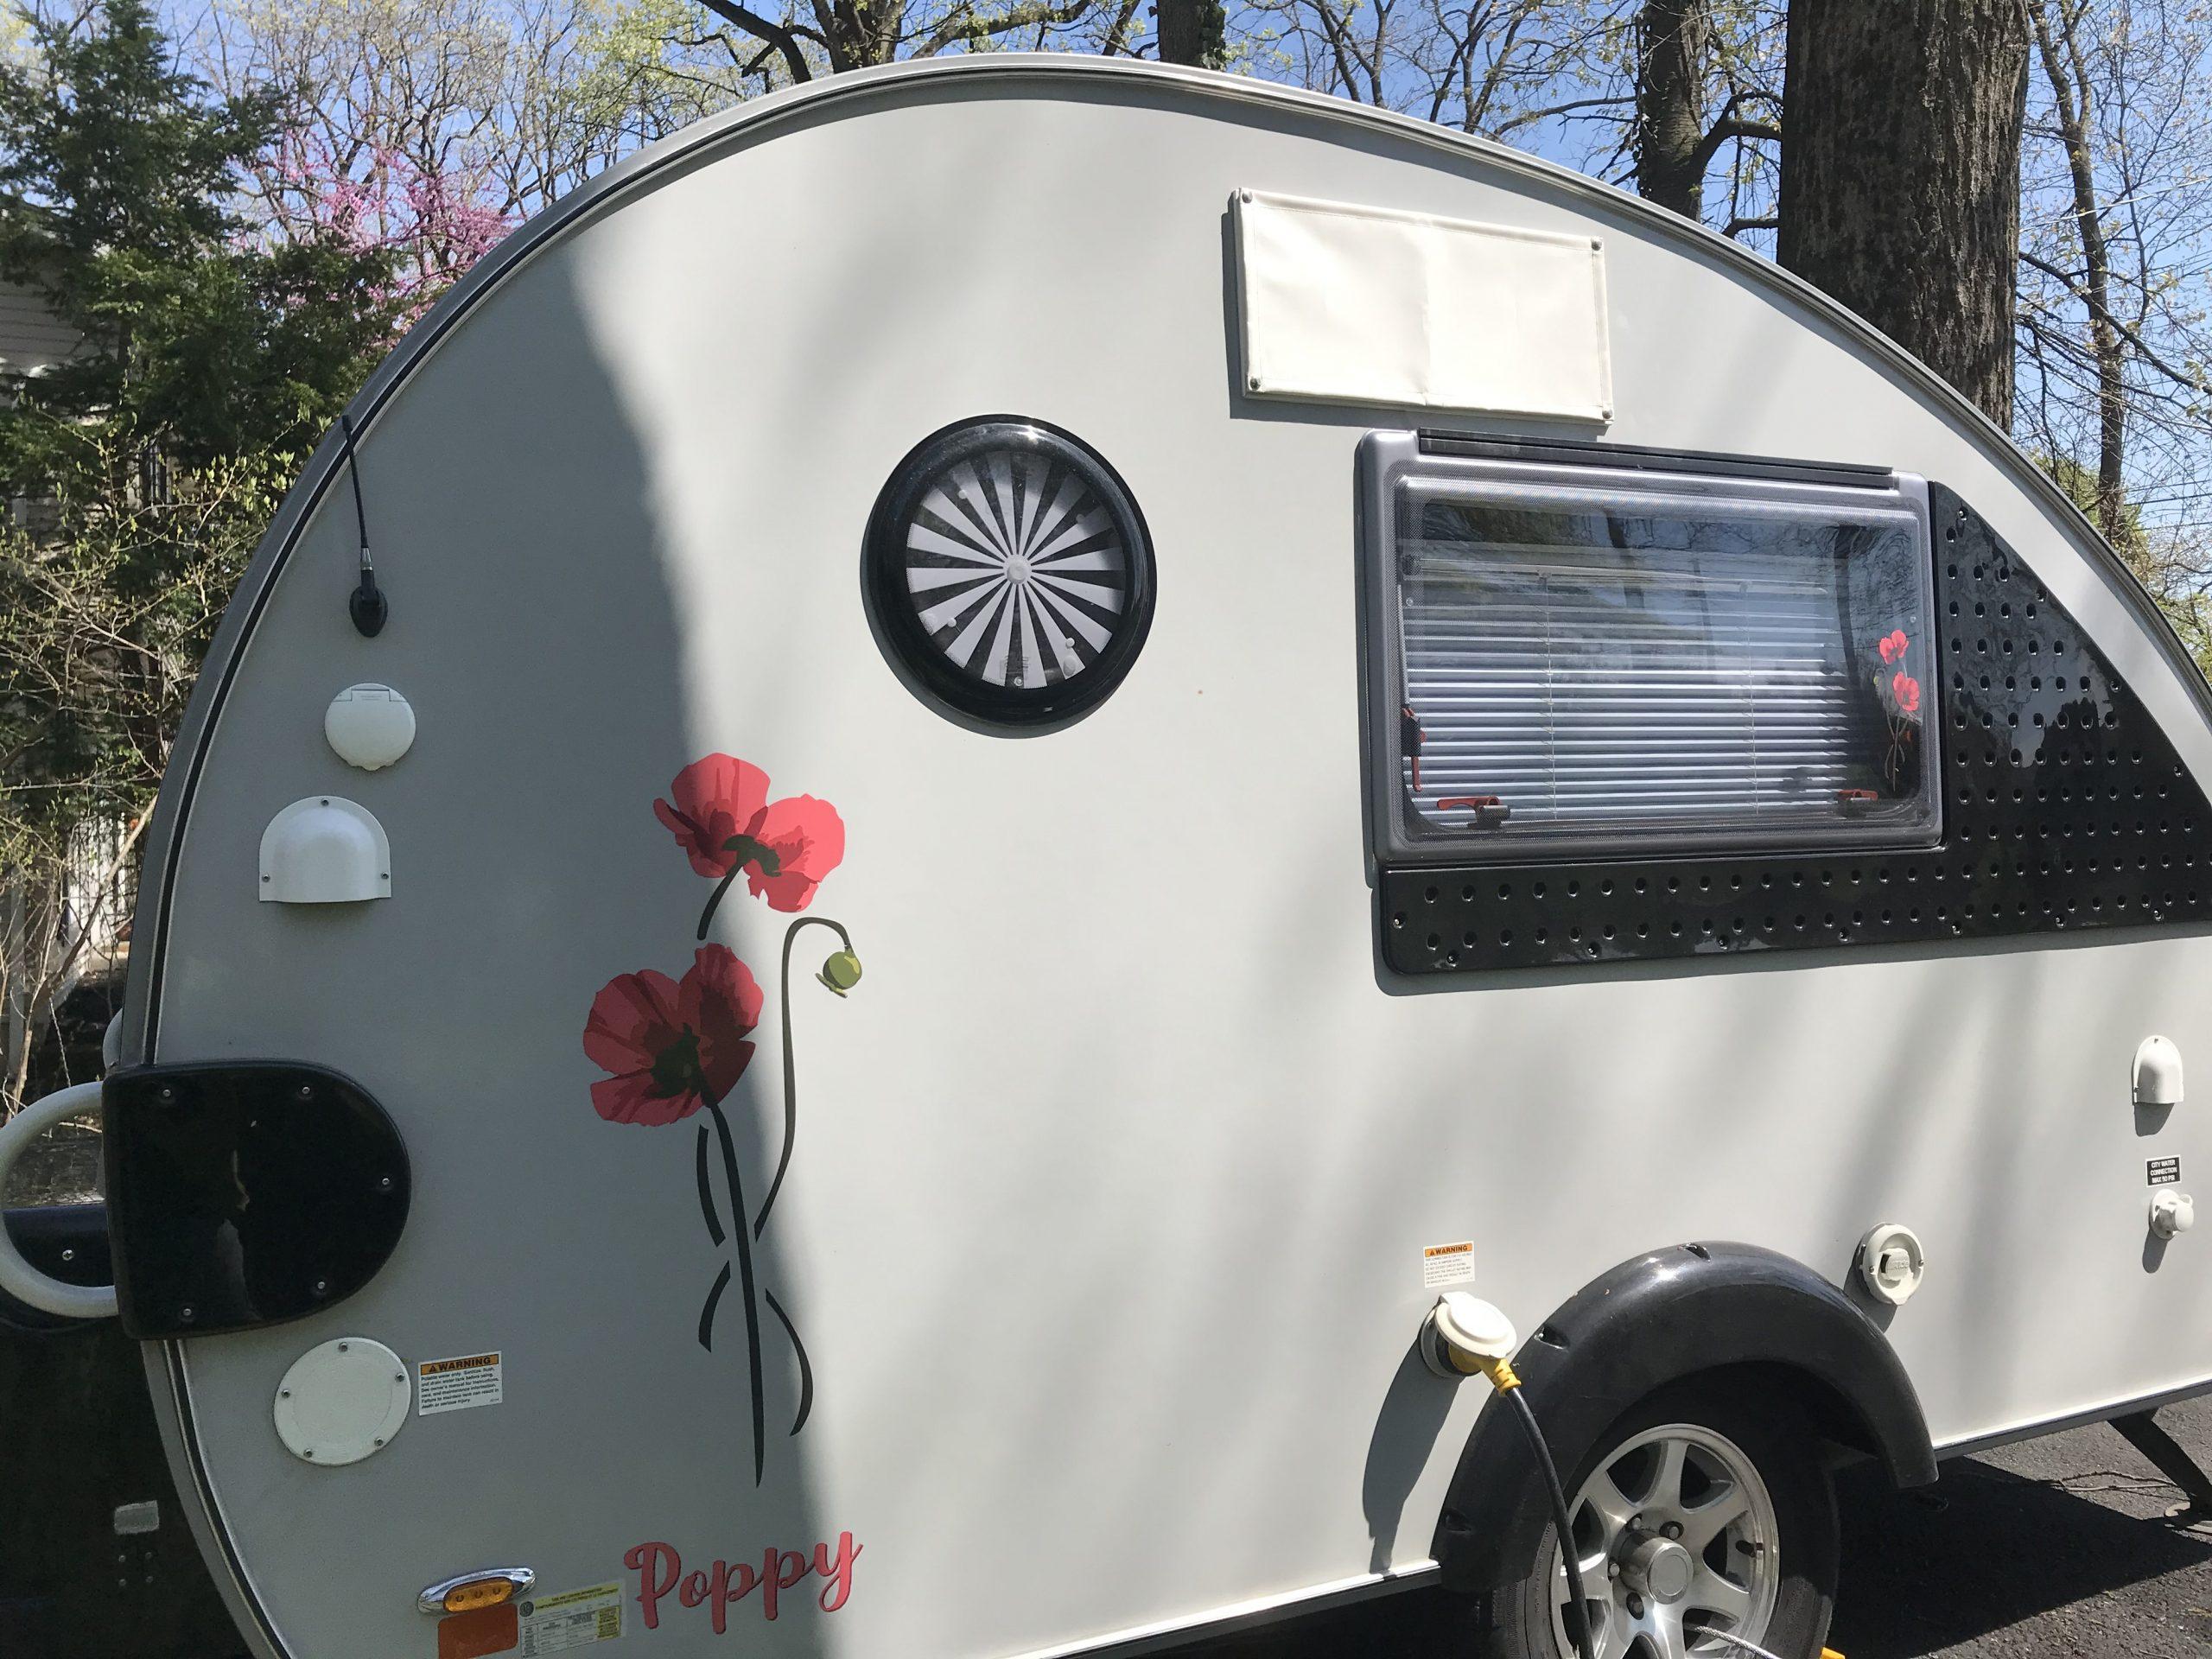 Girl Camper Teardrop Tab Trailer Red Poppy decals on side